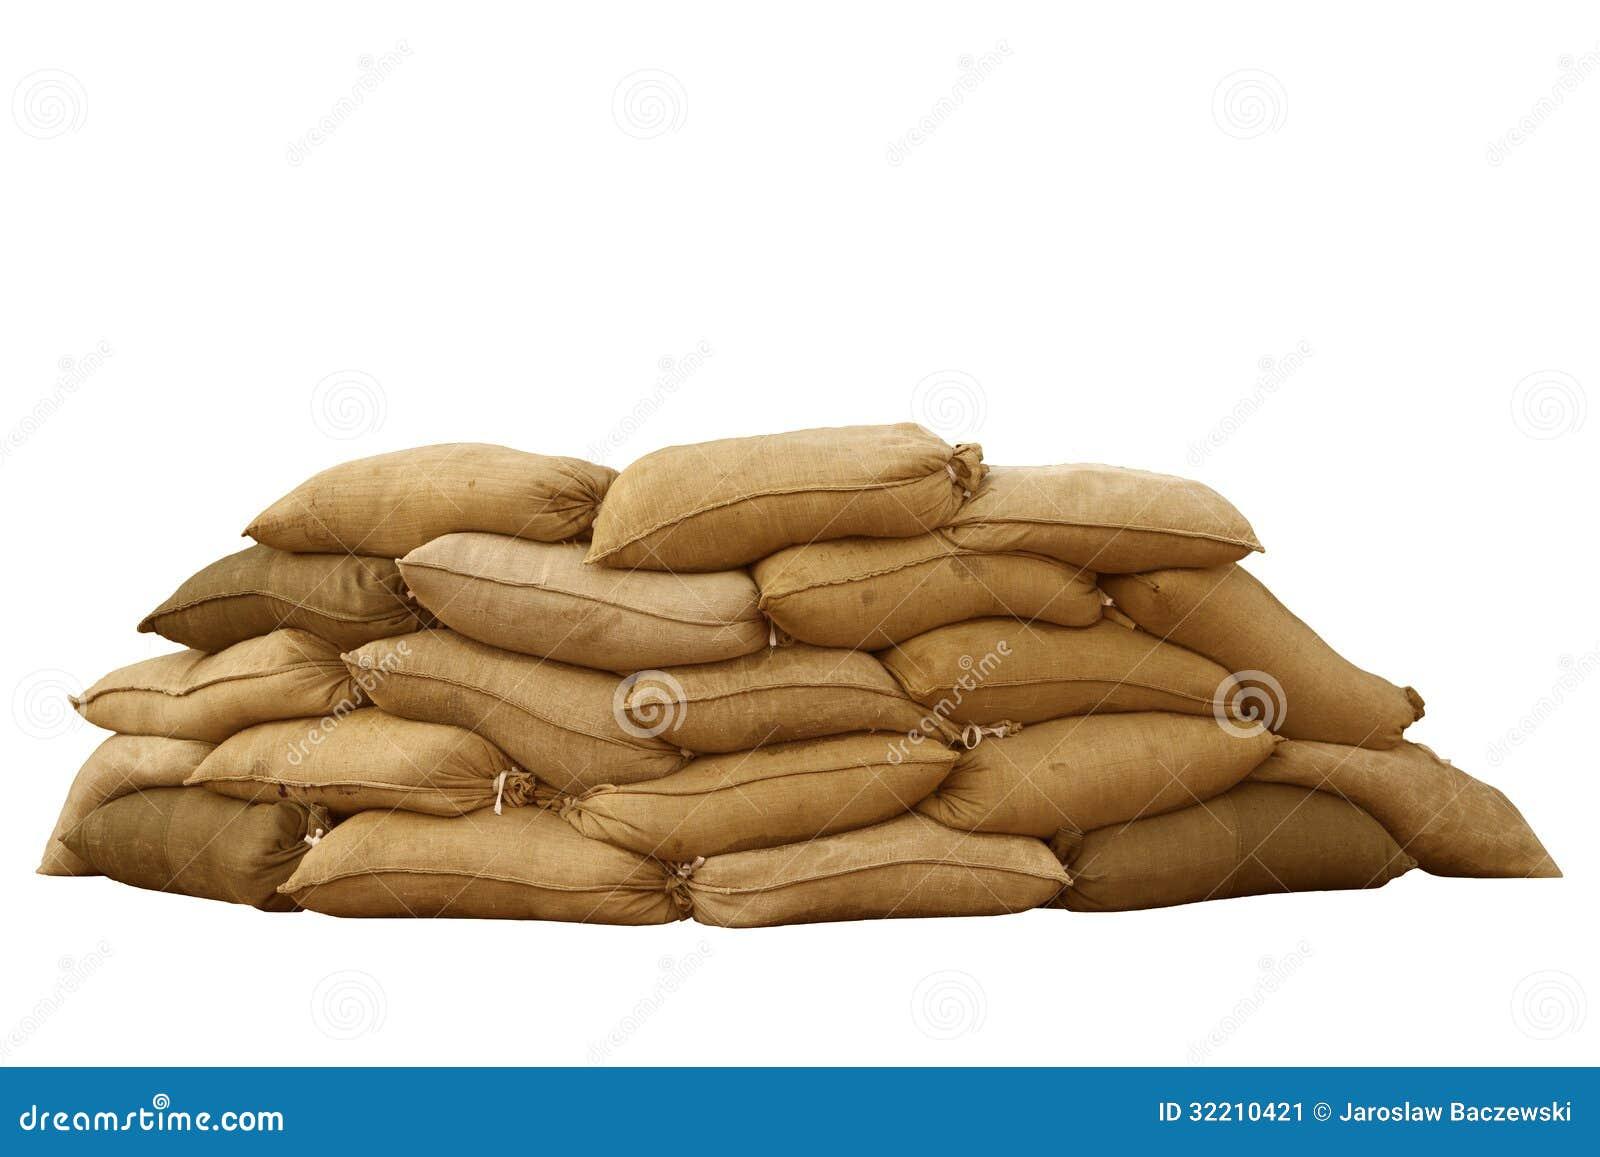 Military Sandbags Clip Art